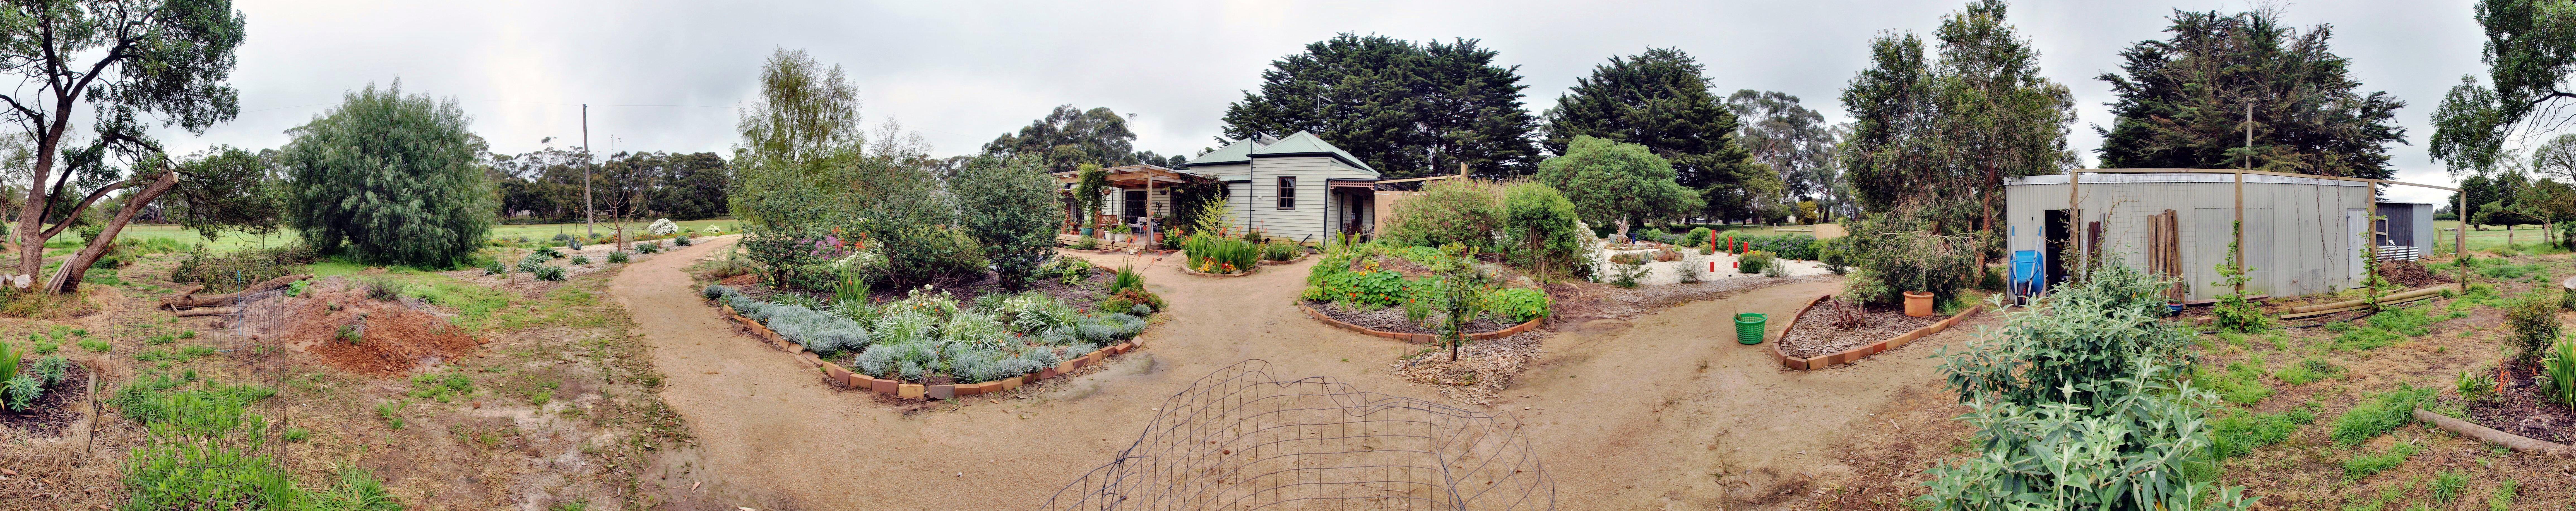 garden-ne-panorama-dup.jpeg